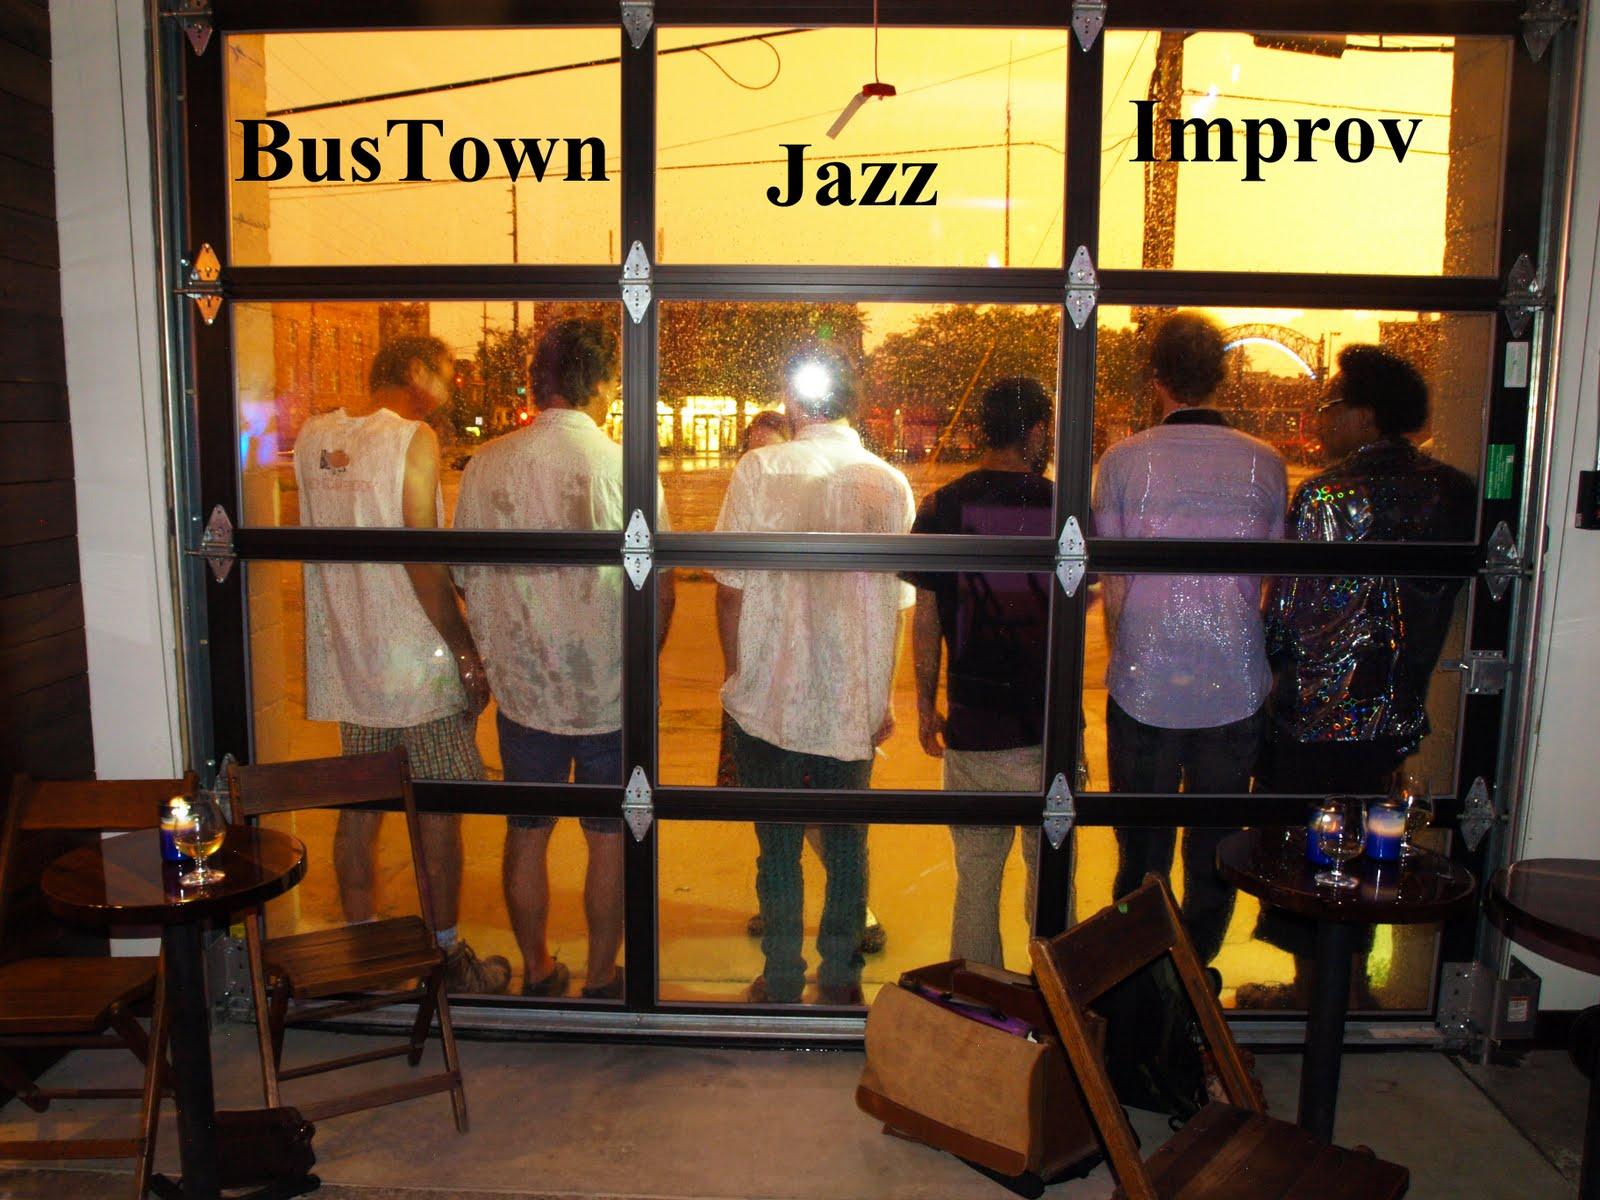 BusTown Music Jazz & Improv